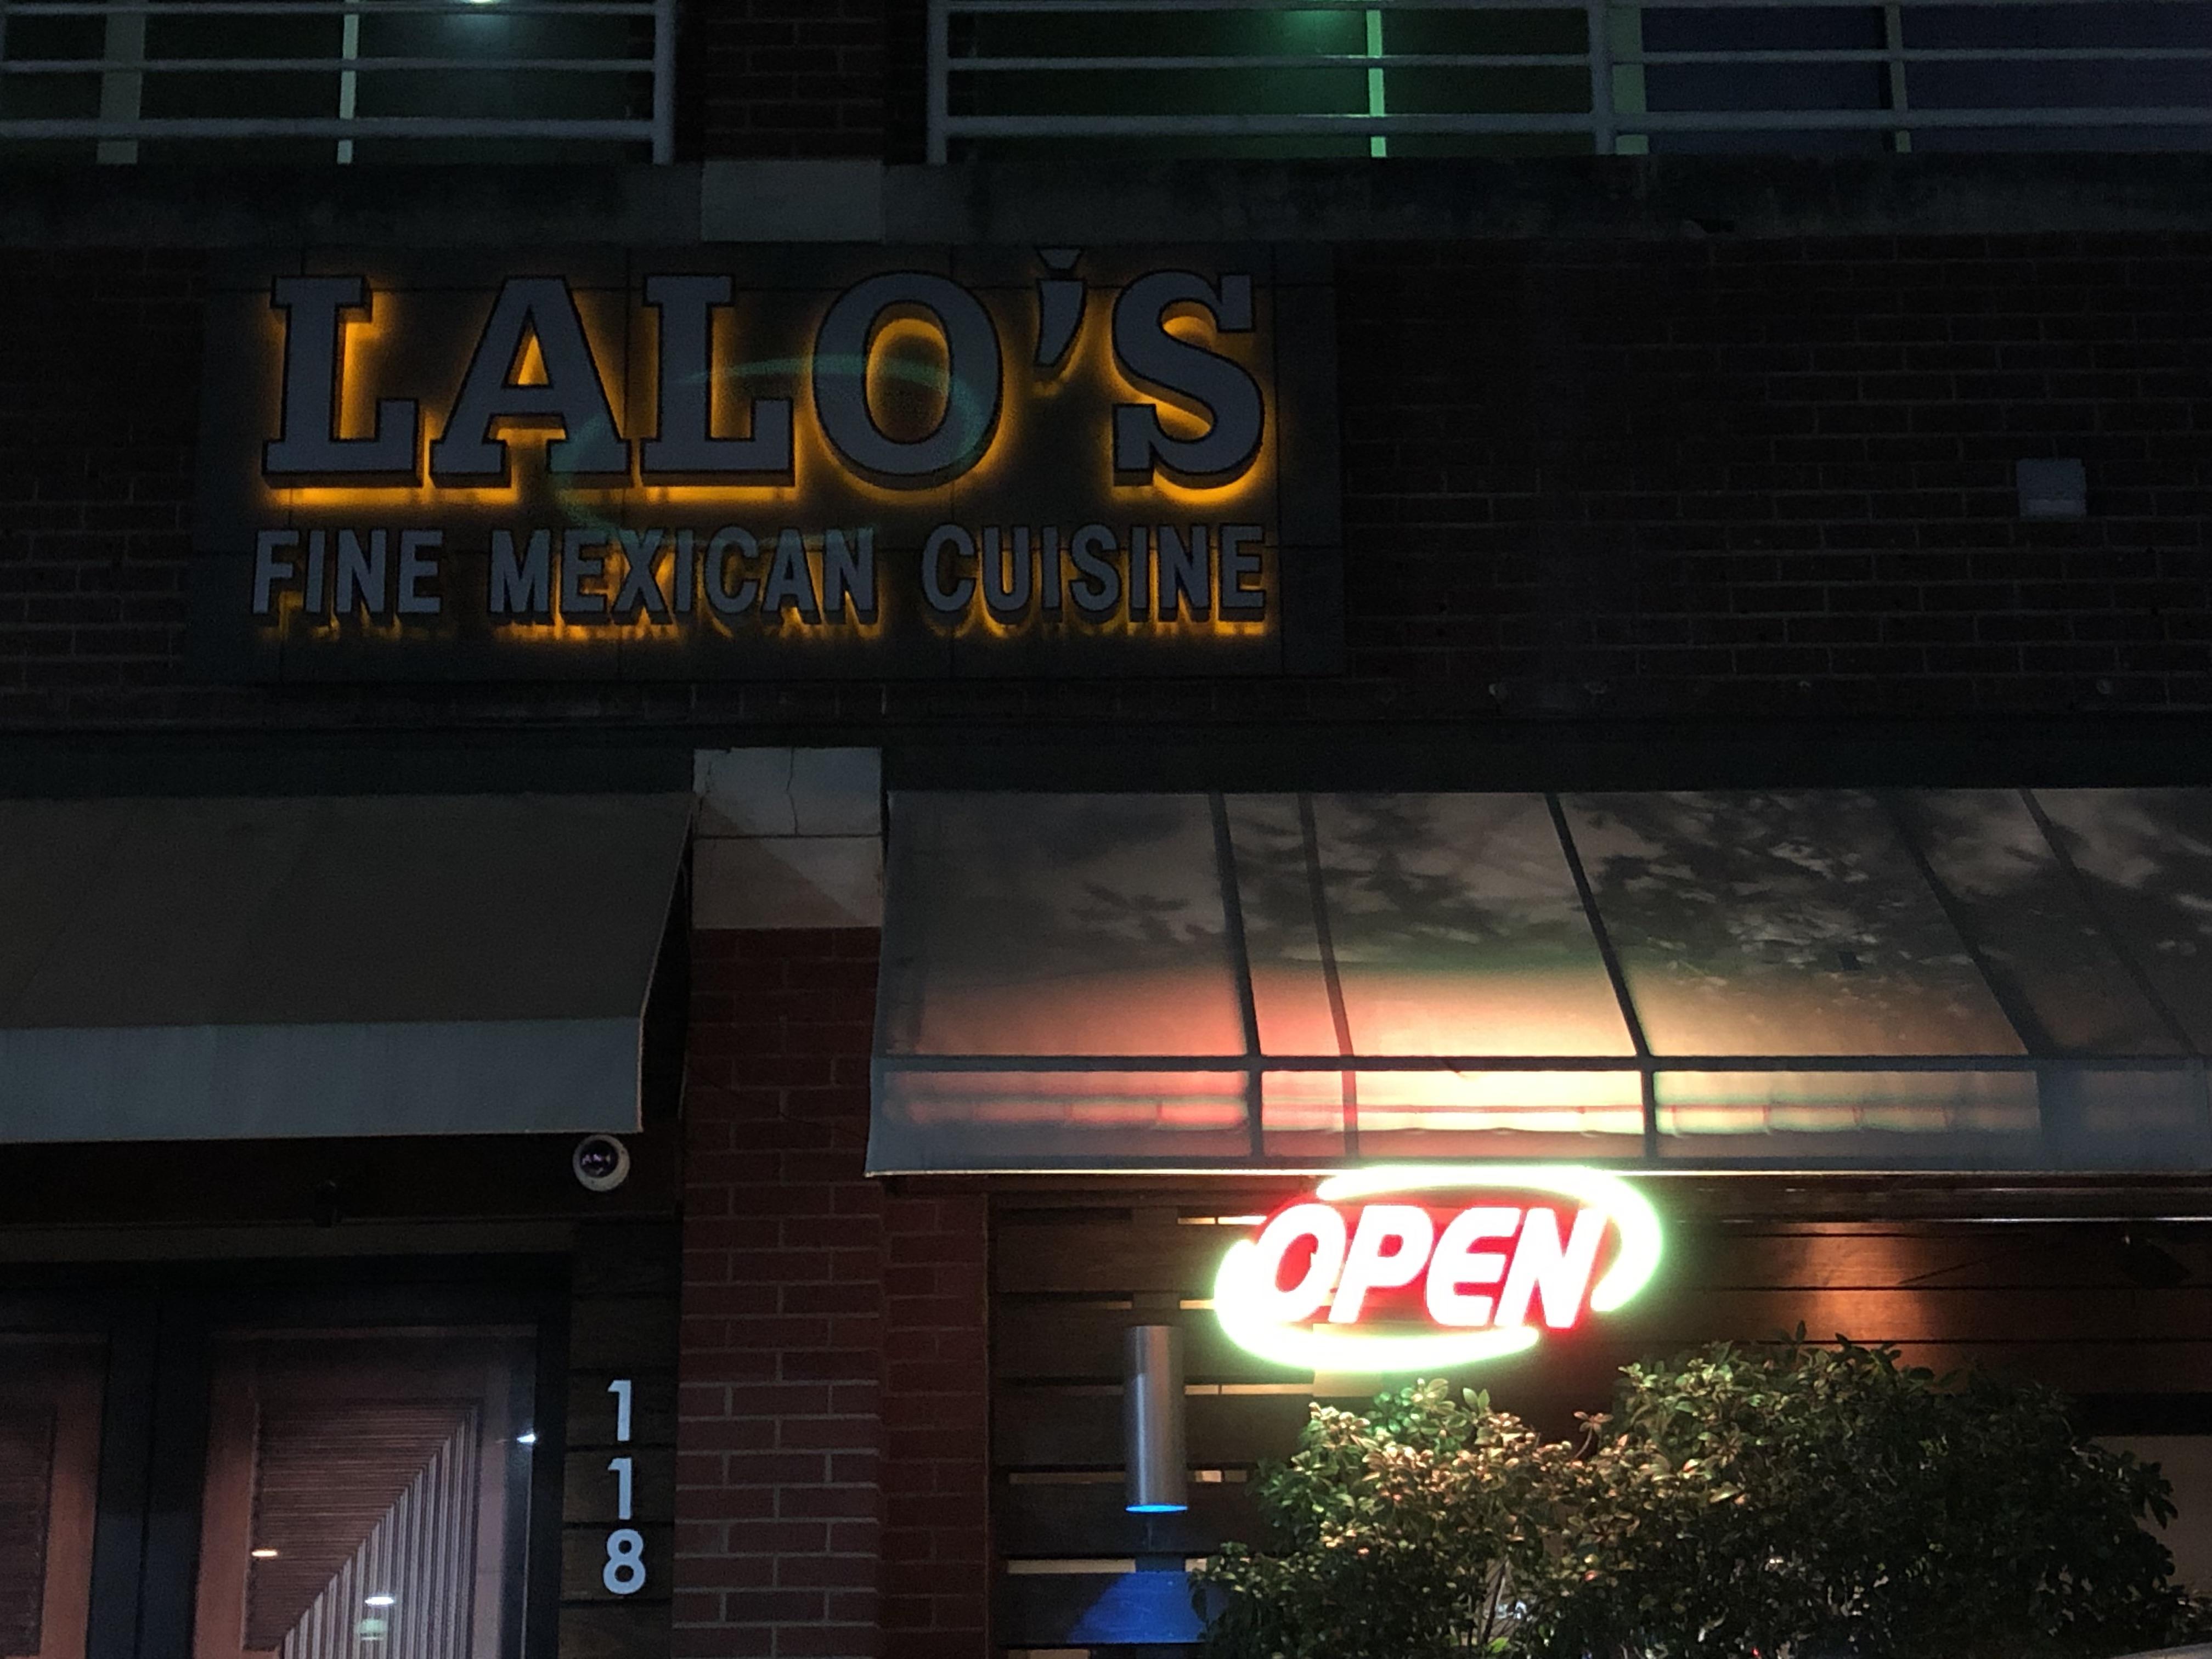 【Tex-Mex】ダラスのおすすめメキシカン料理店~La Lo's Mexican